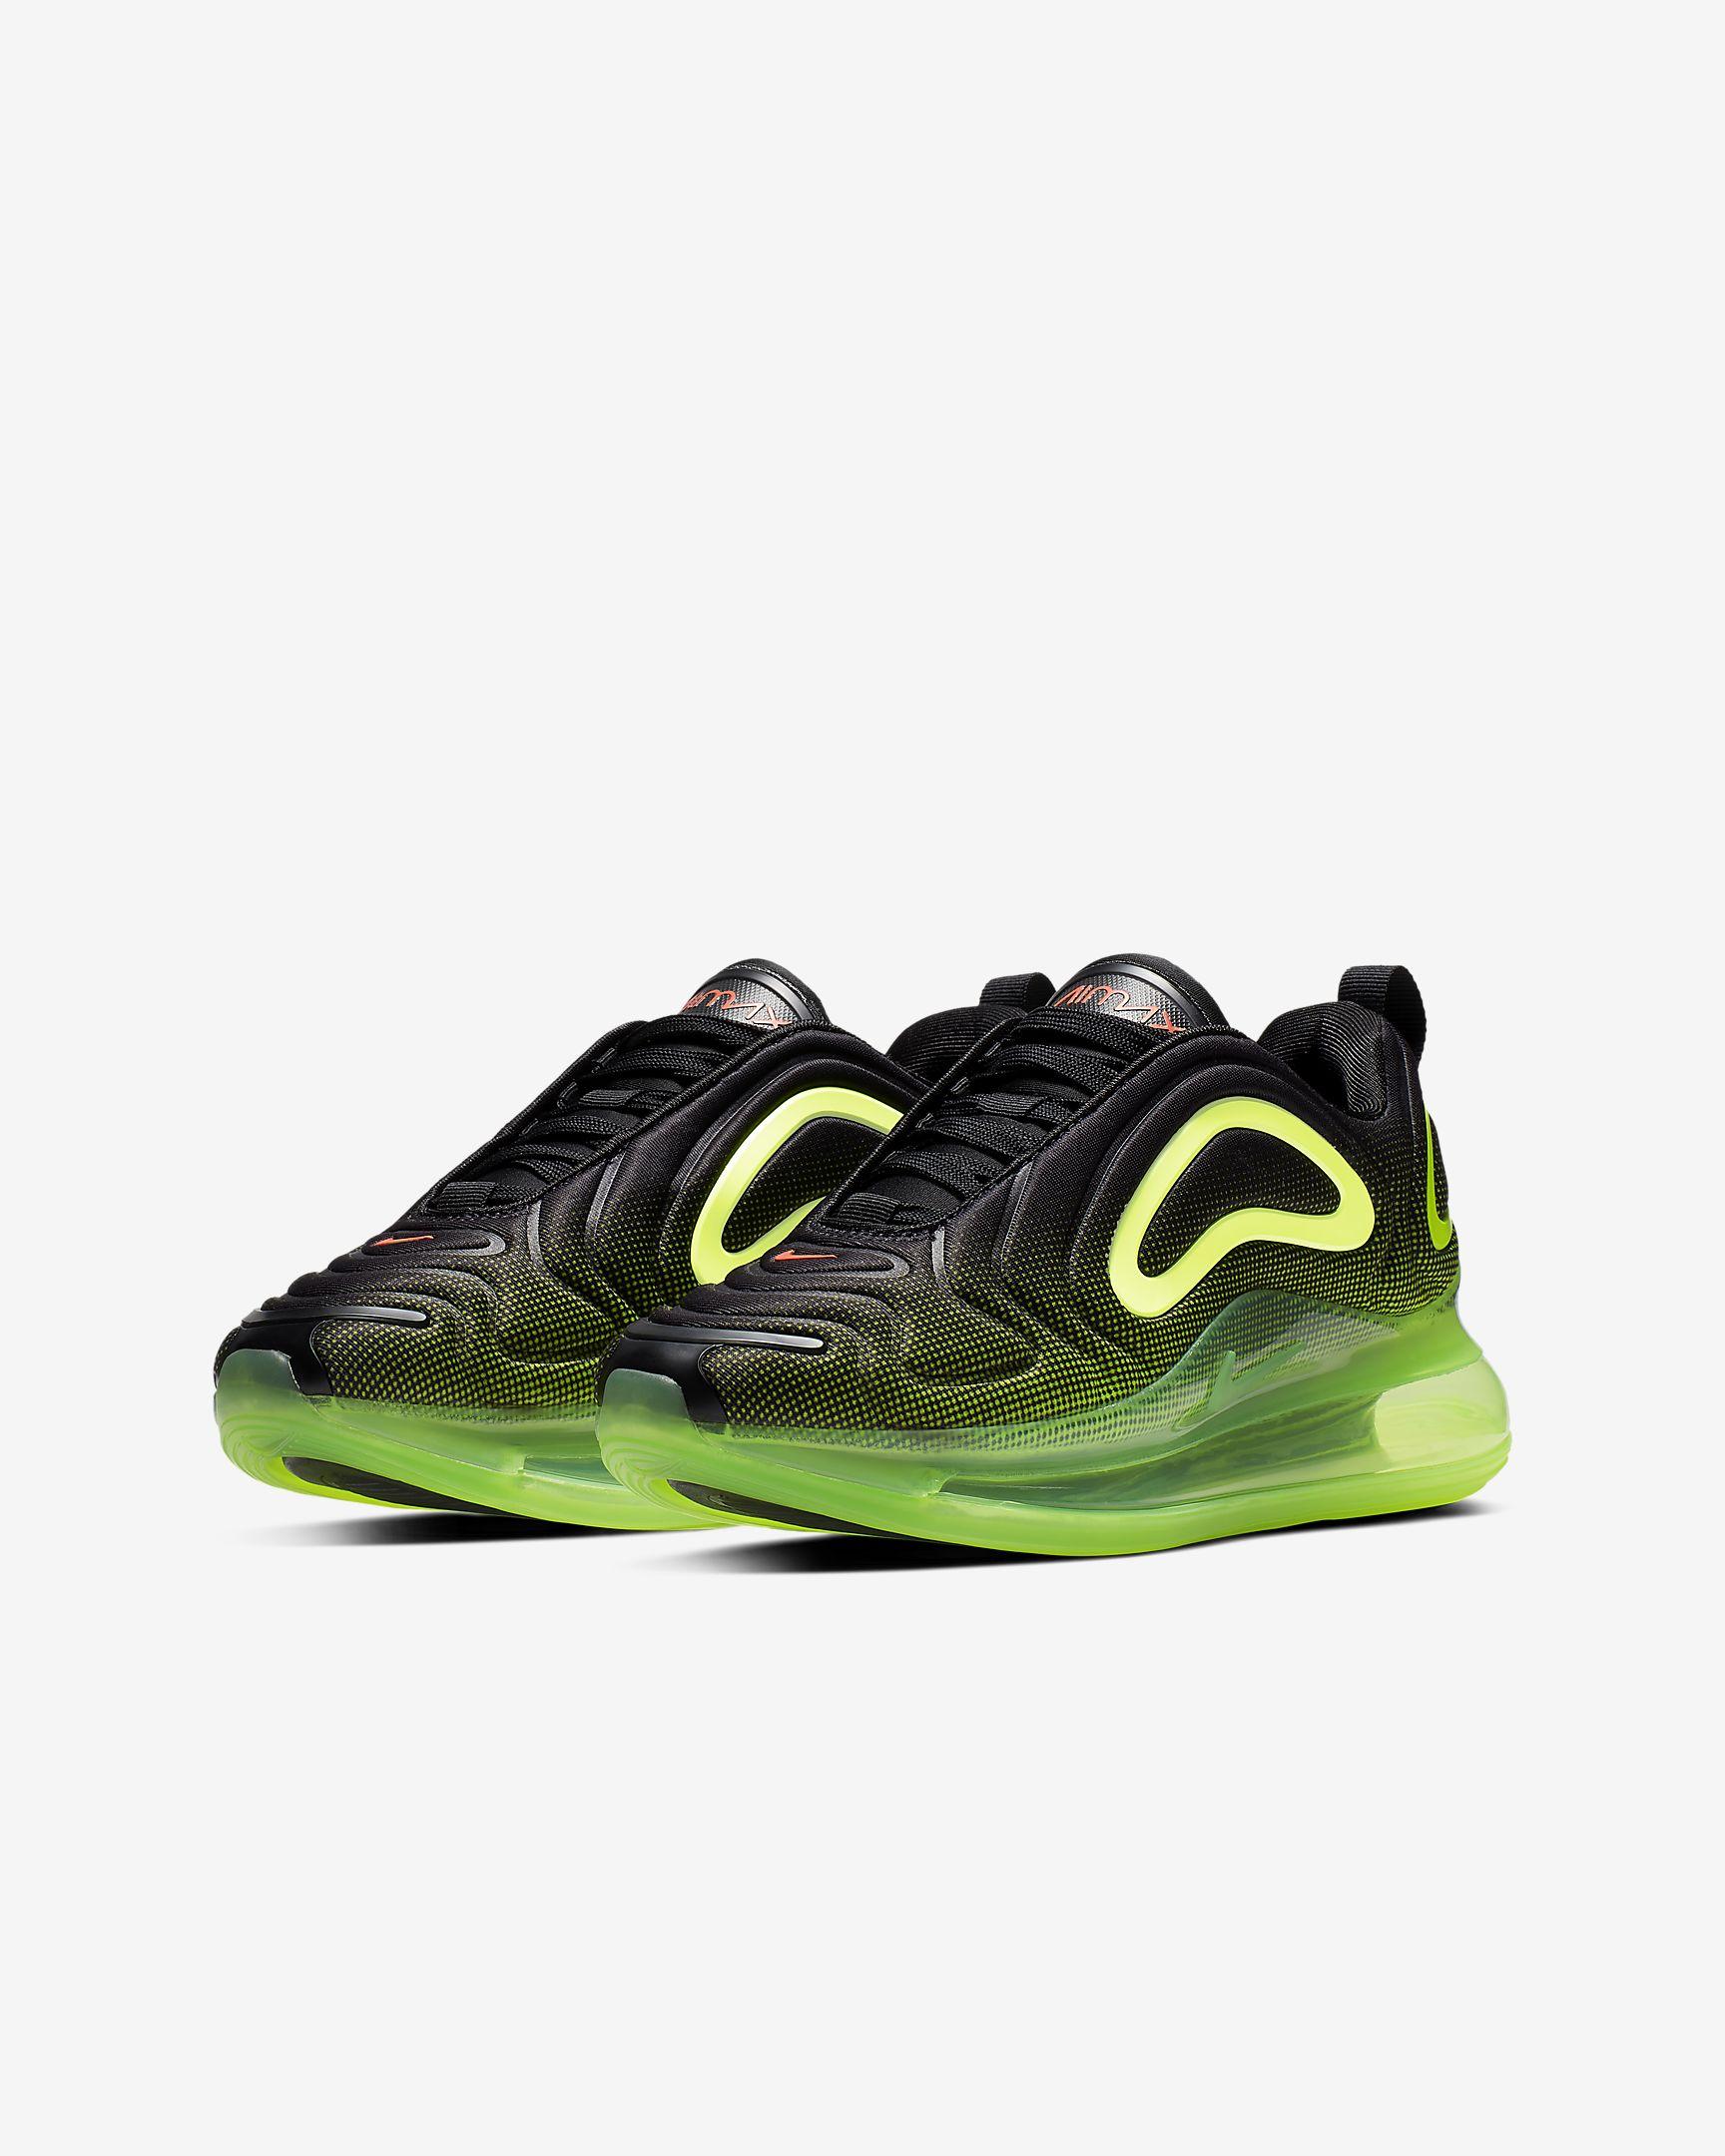 Top 10 Nike Air Max 720 | Sneakerjagers